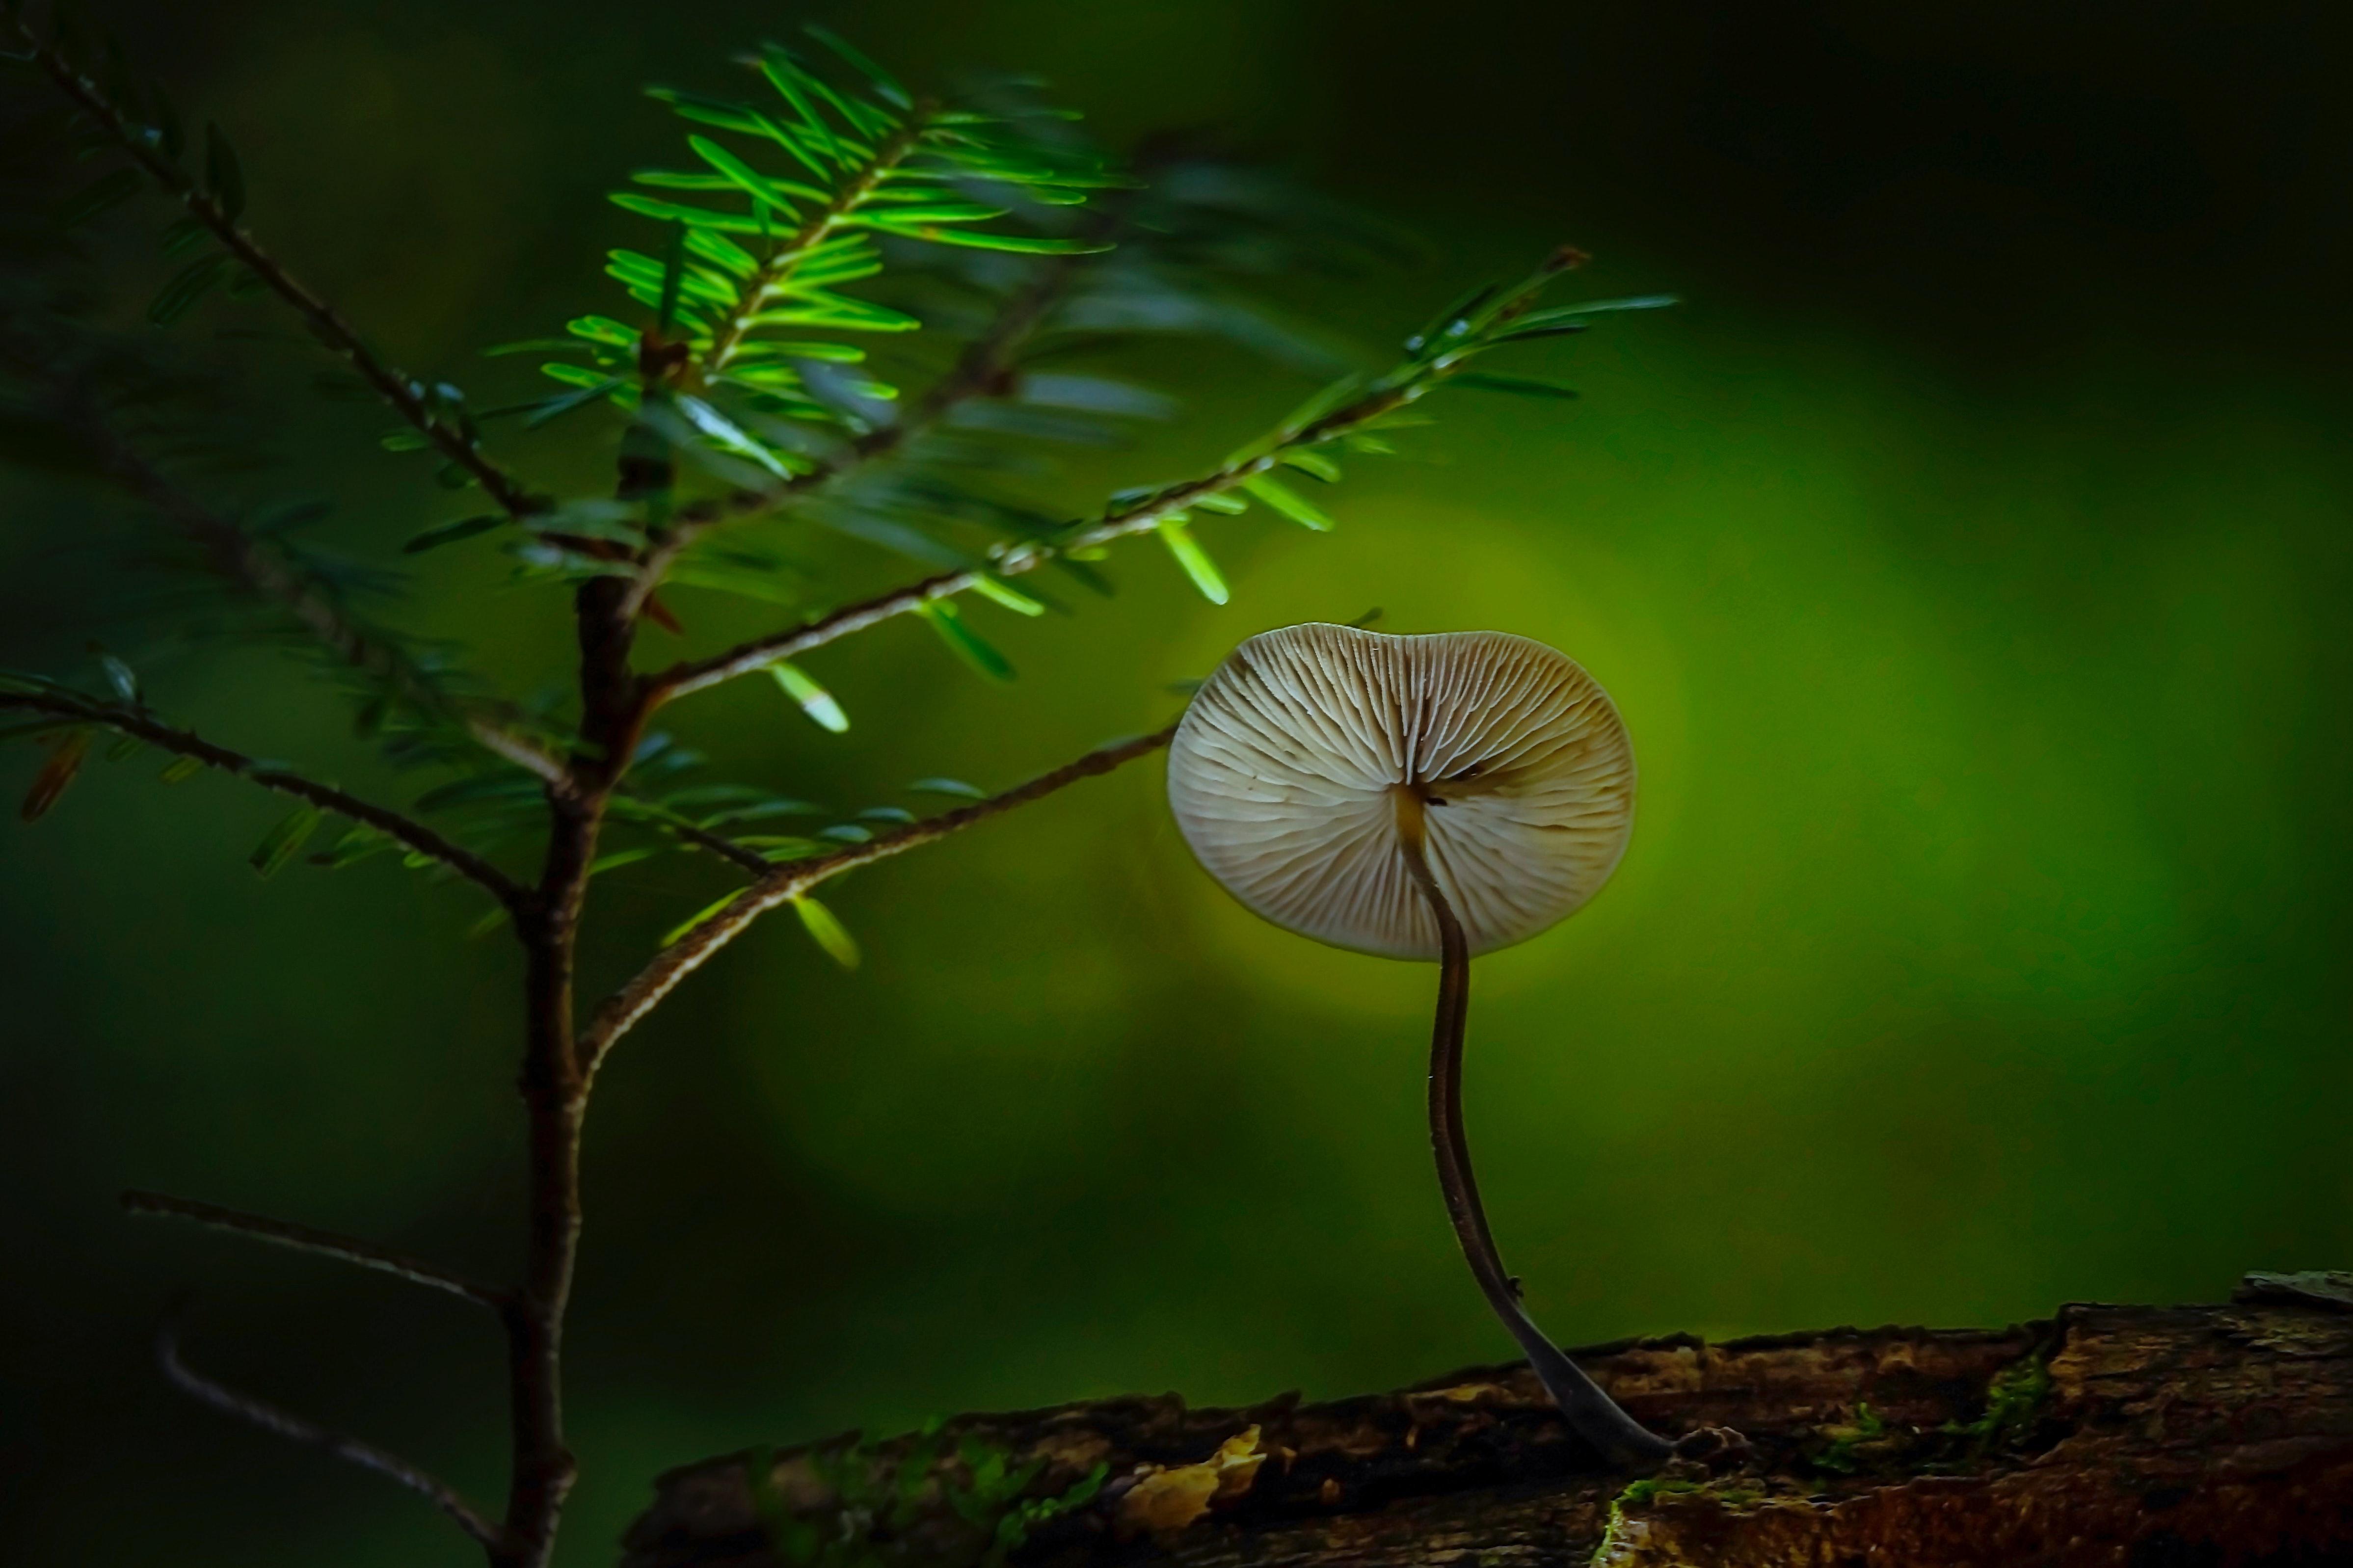 Brown and Gray Mushroom on Brown Sand Near Green Plant, Biology, Miniature, Wild, Tree, HQ Photo